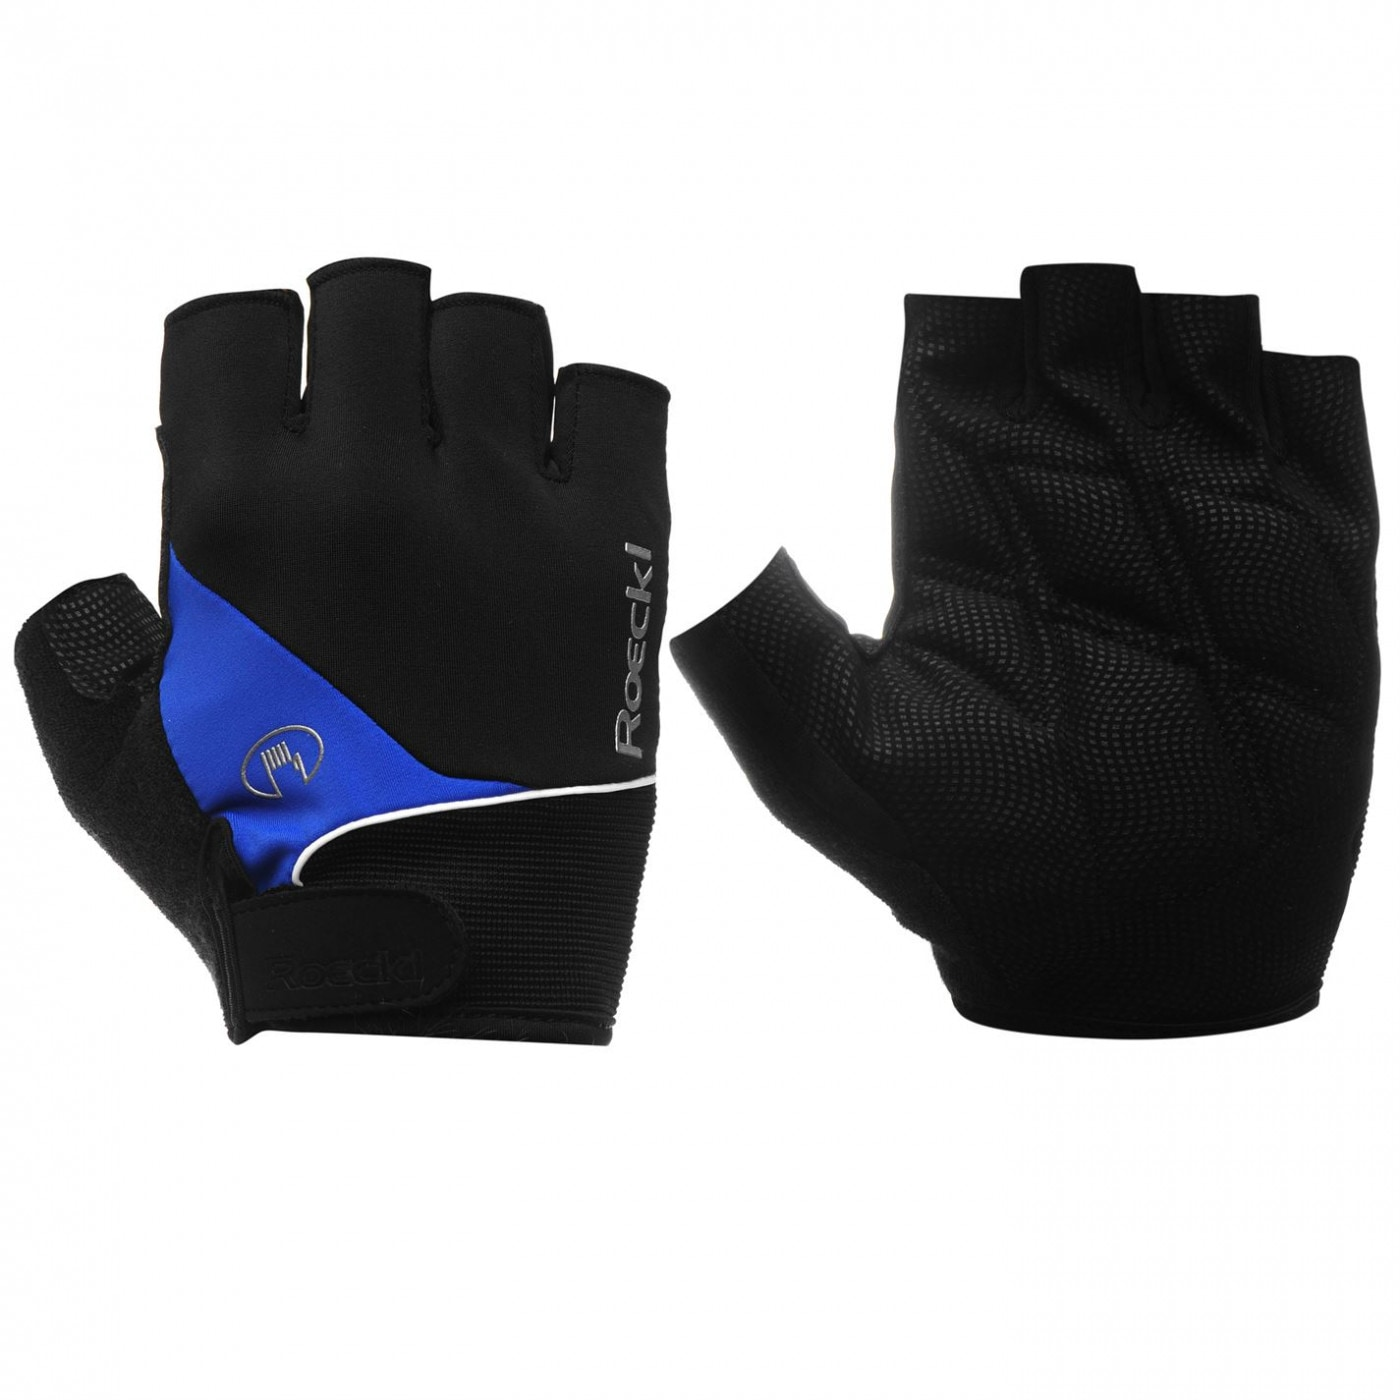 Roeckl Napoli Gloves